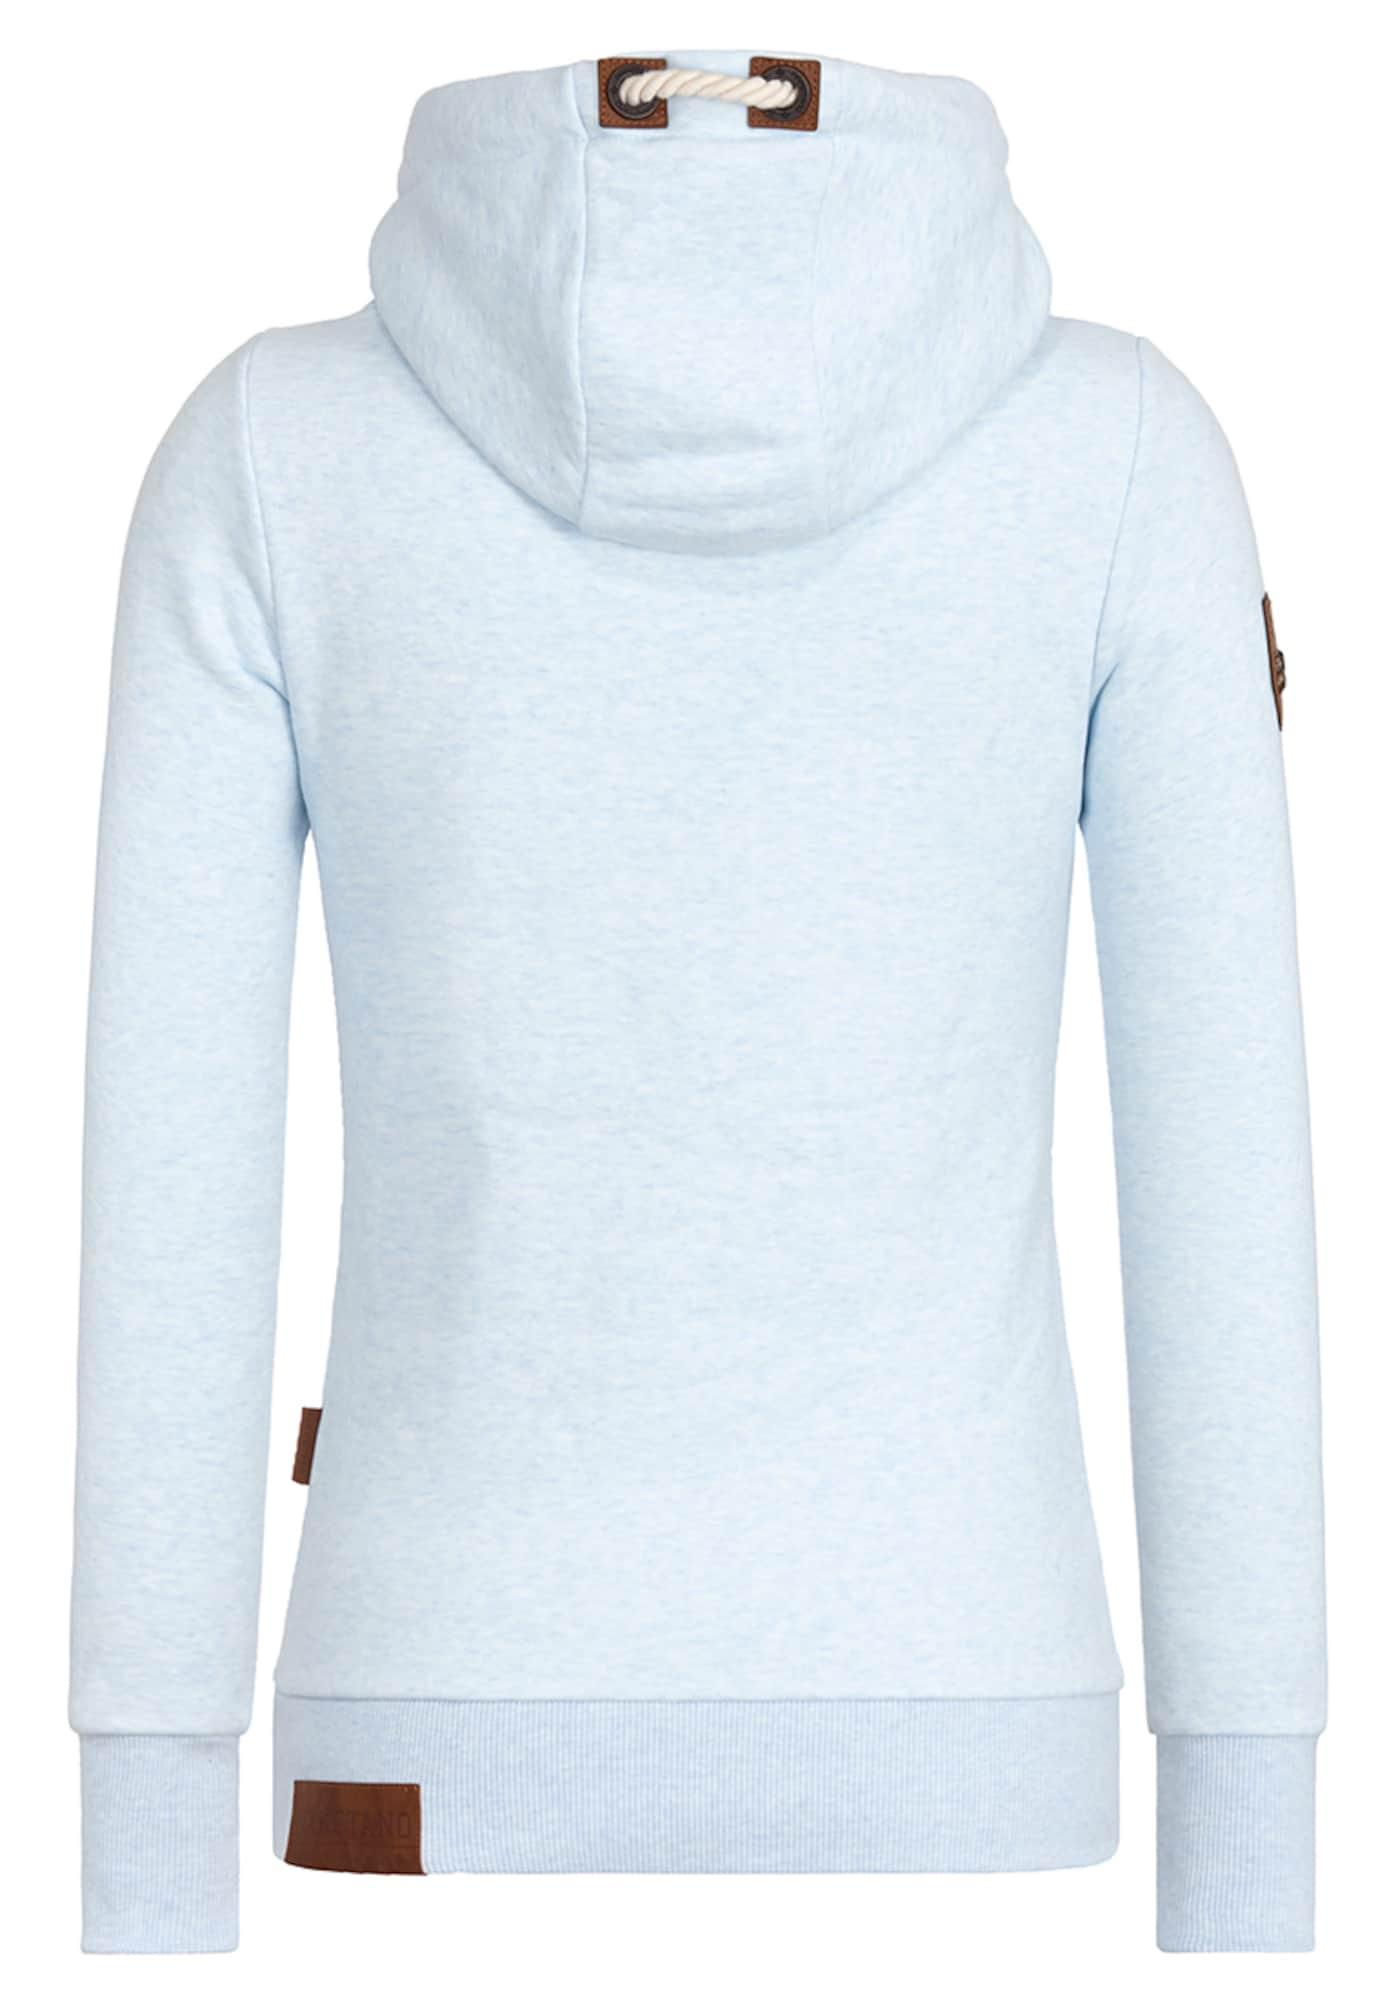 Sweatshirt 'Schmierlappen IX'